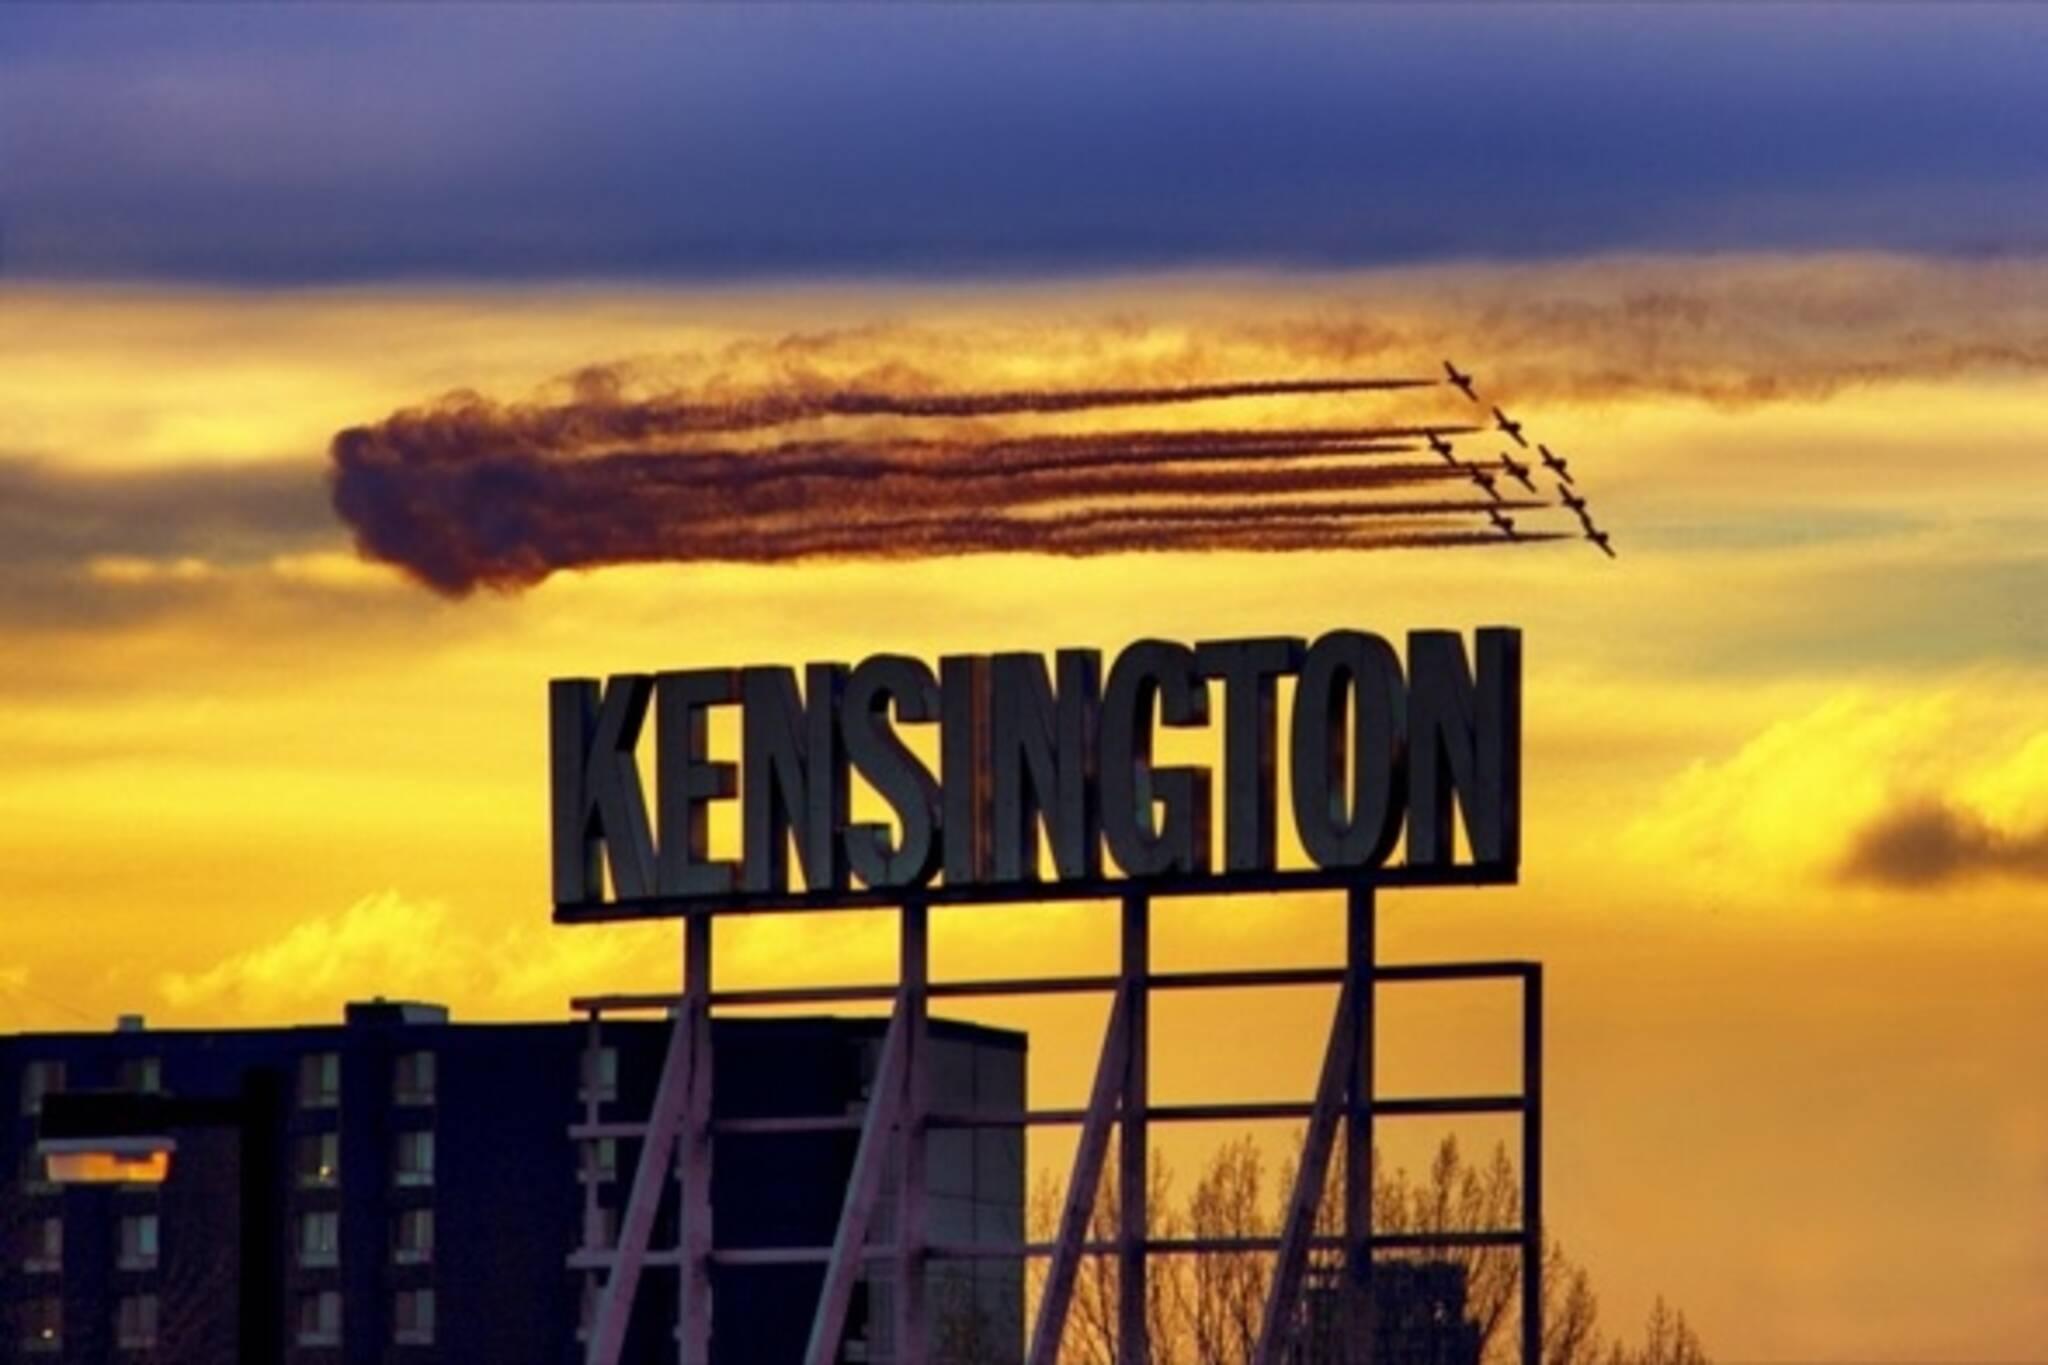 Reflecting Kensington celebrates the market